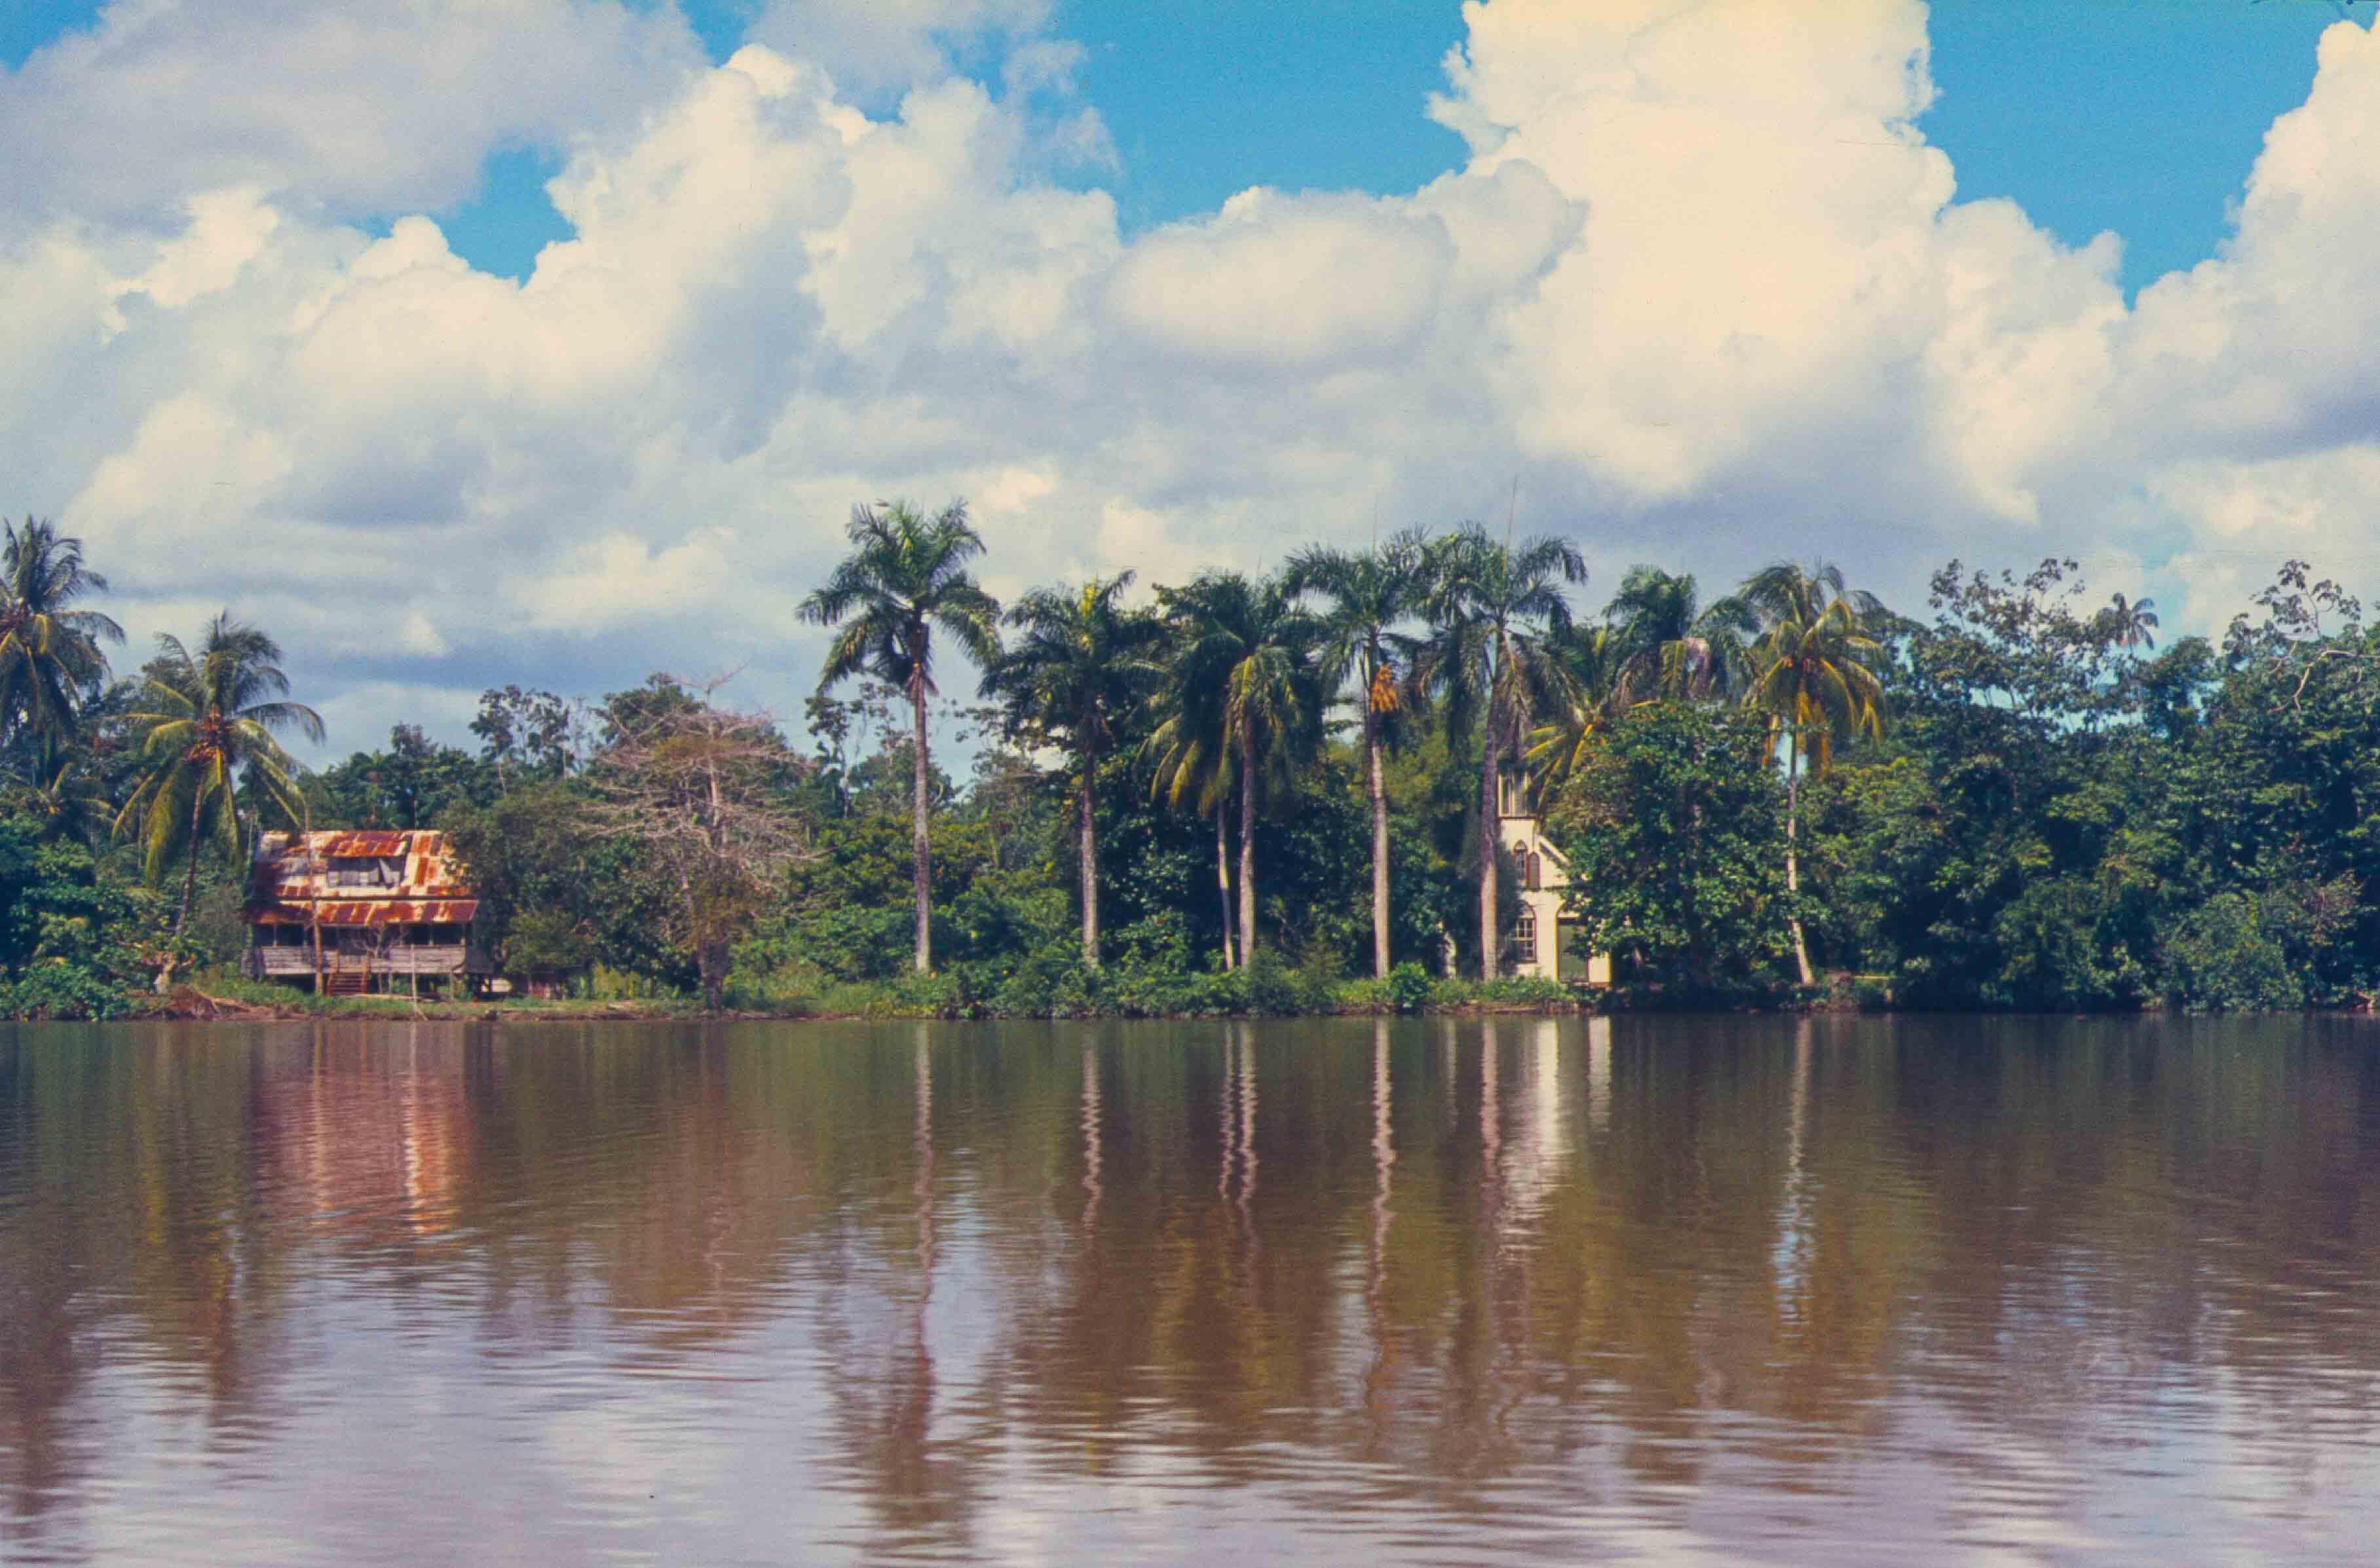 545. Suriname